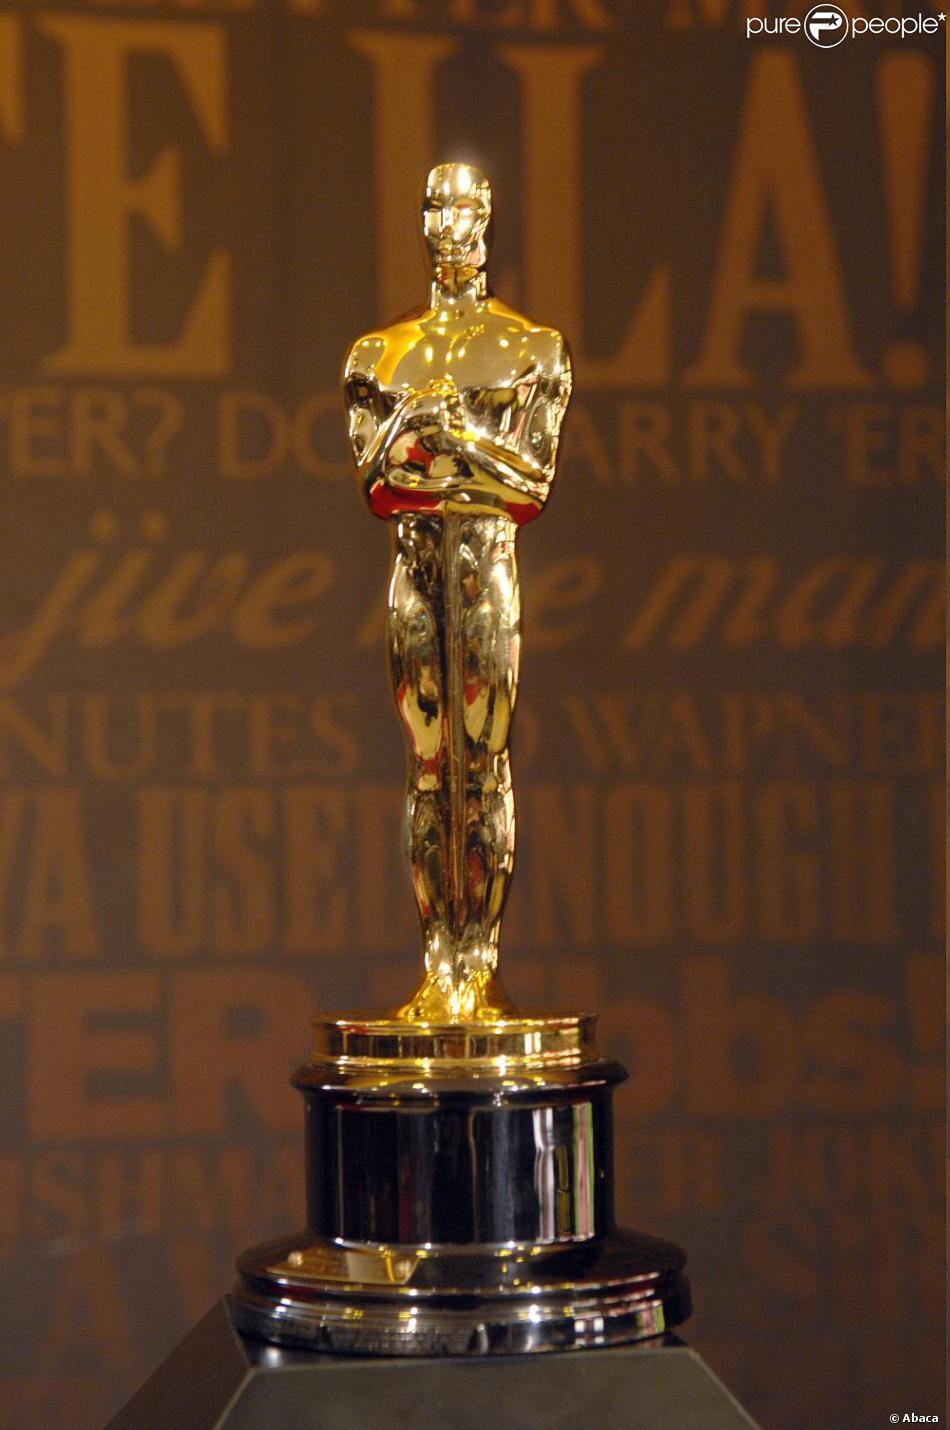 Le Fameux Troph U00e9e Des Oscars